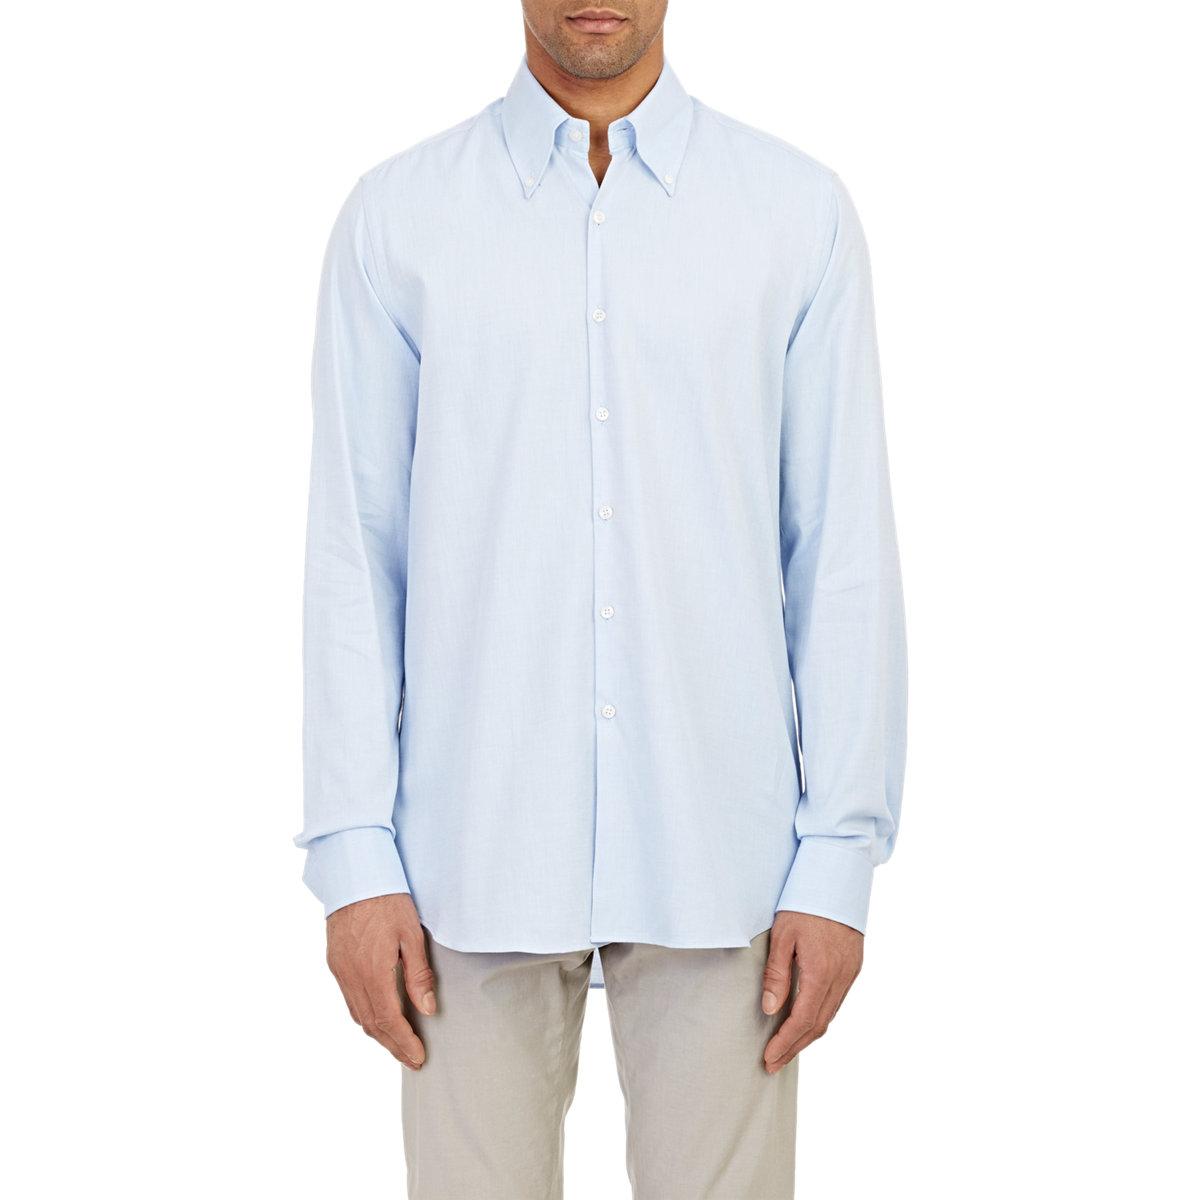 Lyst piattelli oxford shirt in blue for men for Mens blue oxford shirt